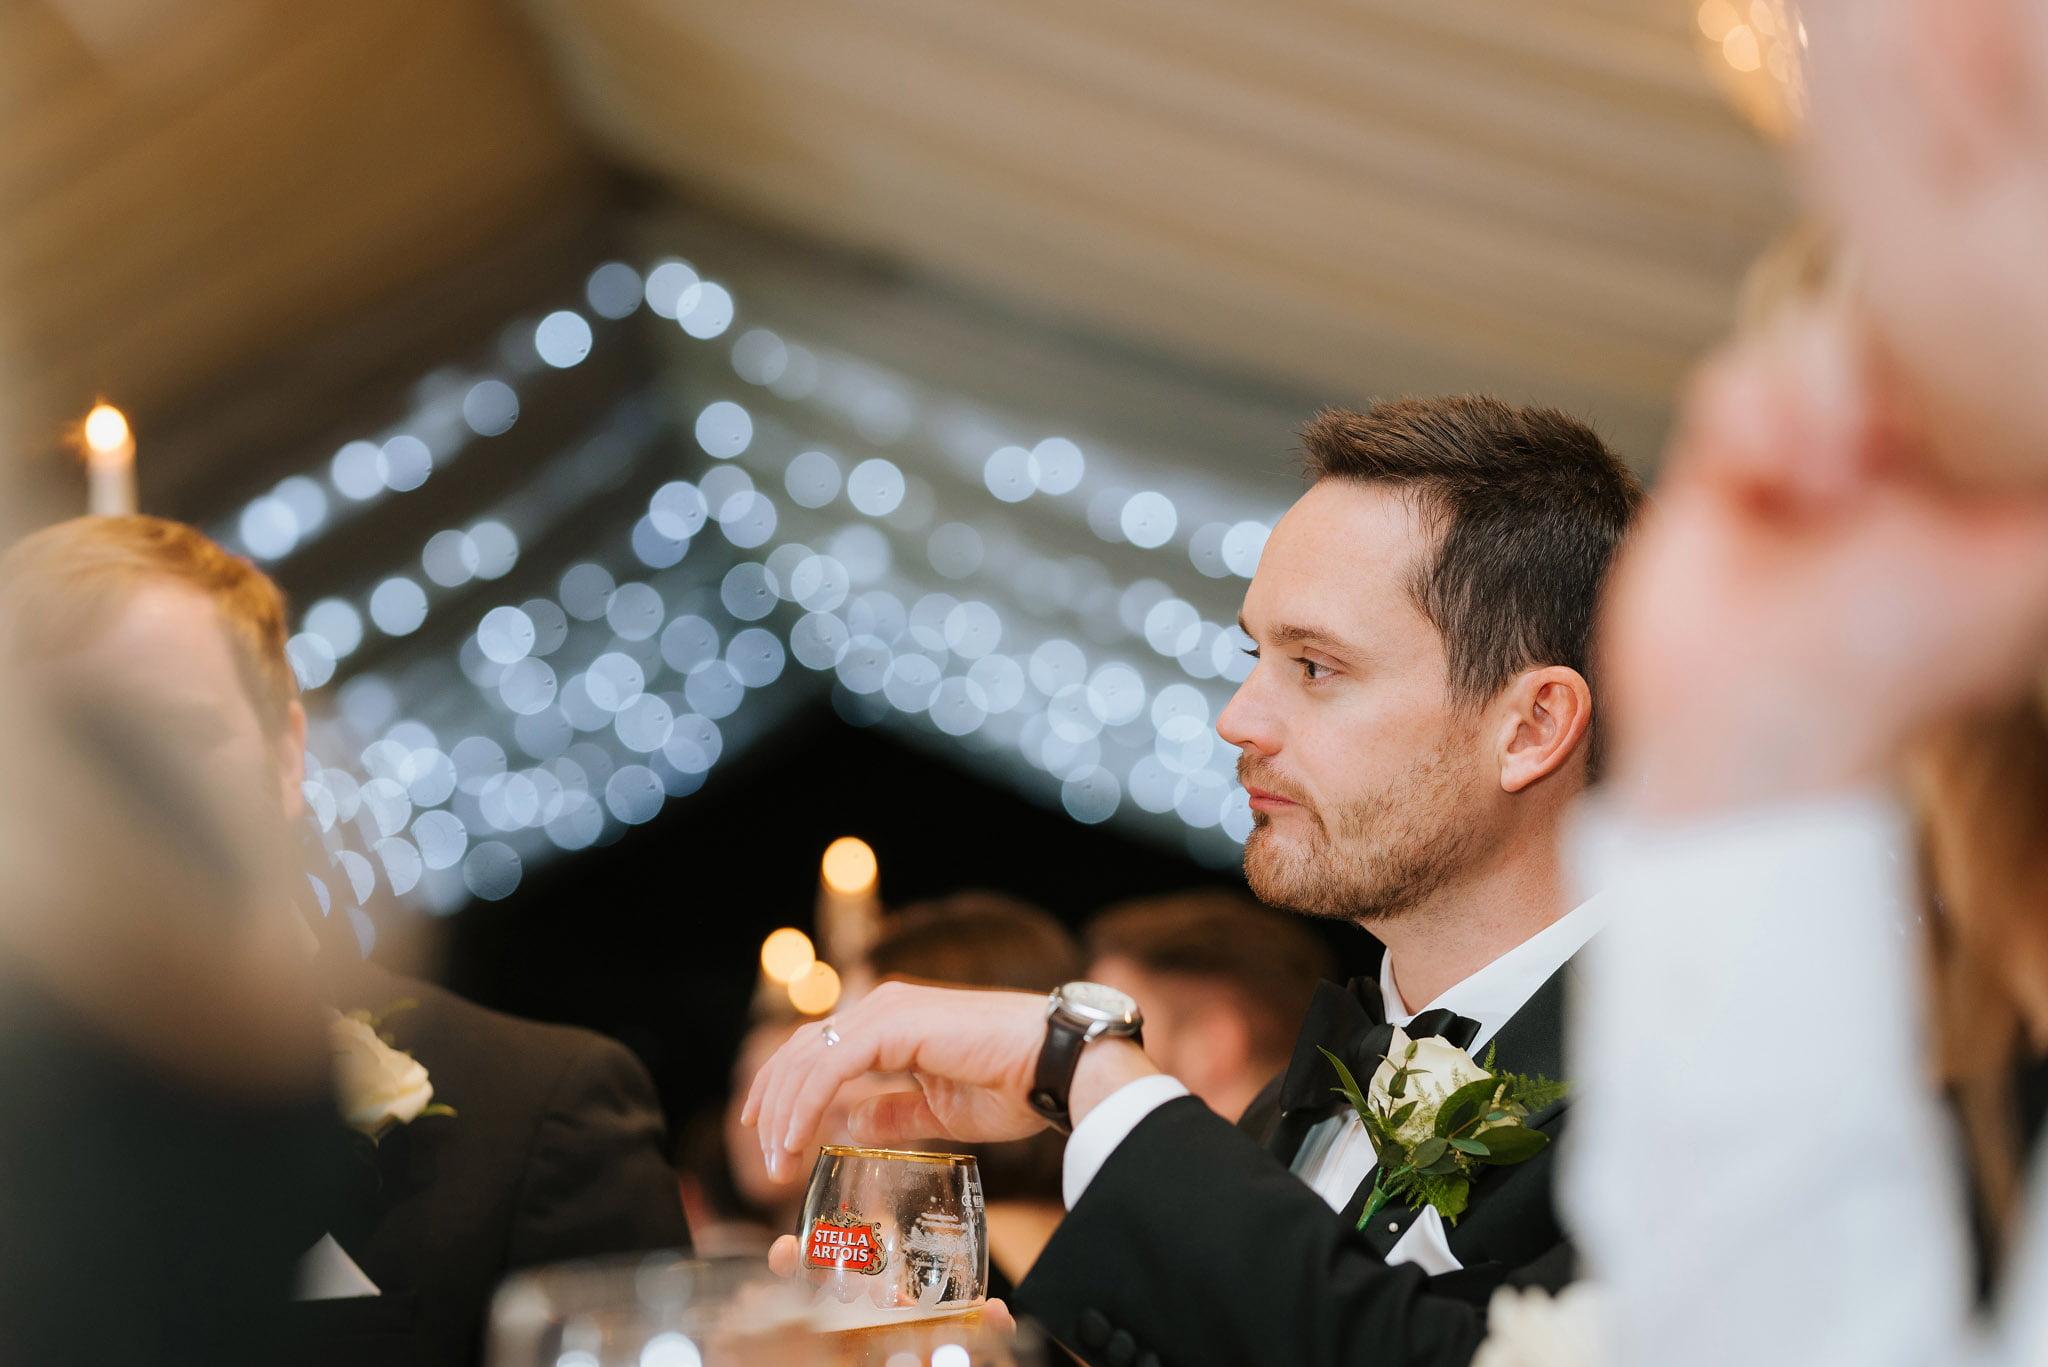 Coombe Abbey wedding in Coventry, Warwickshire - Sam + Matt 60